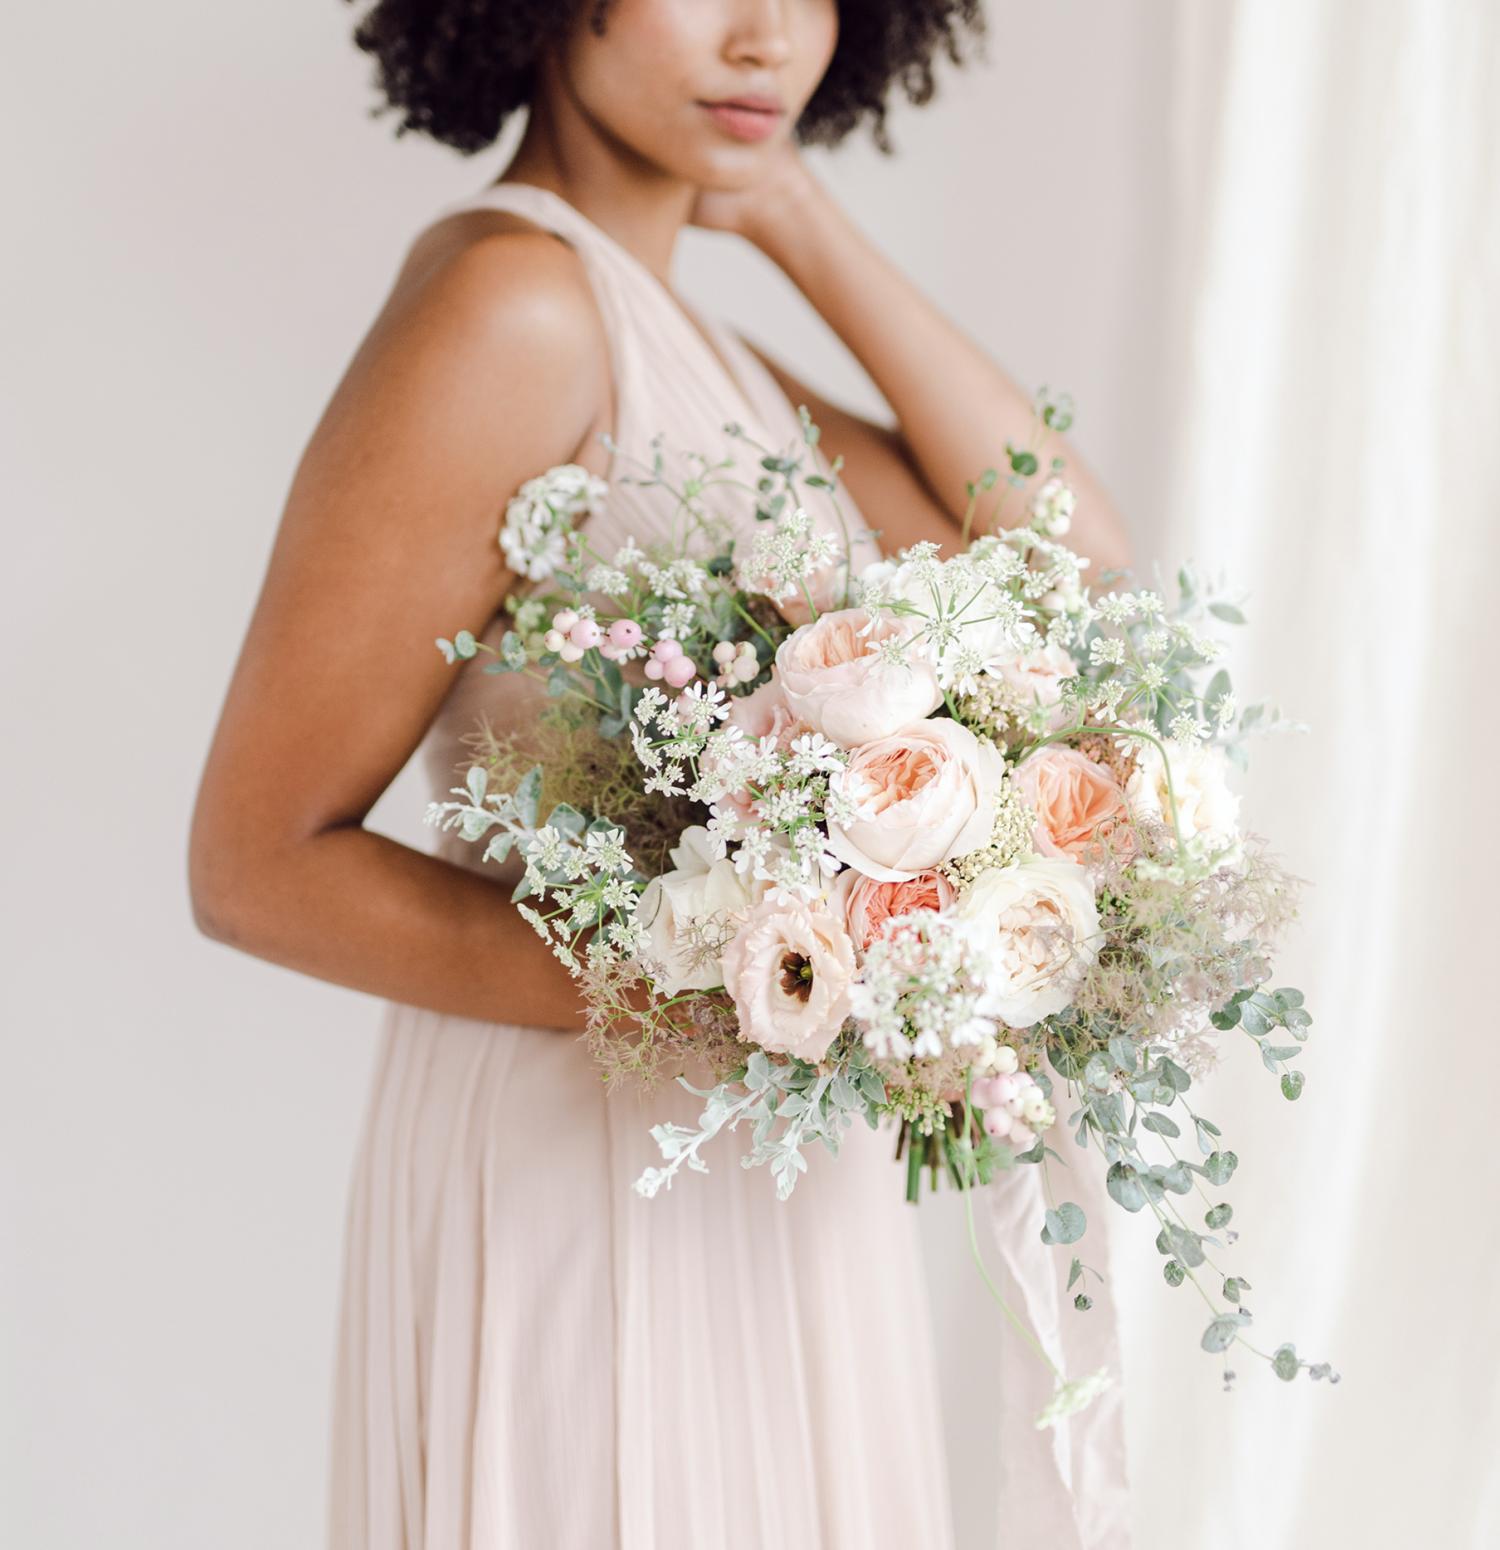 Juliet rose in wedding bouquet by Joseph Massey